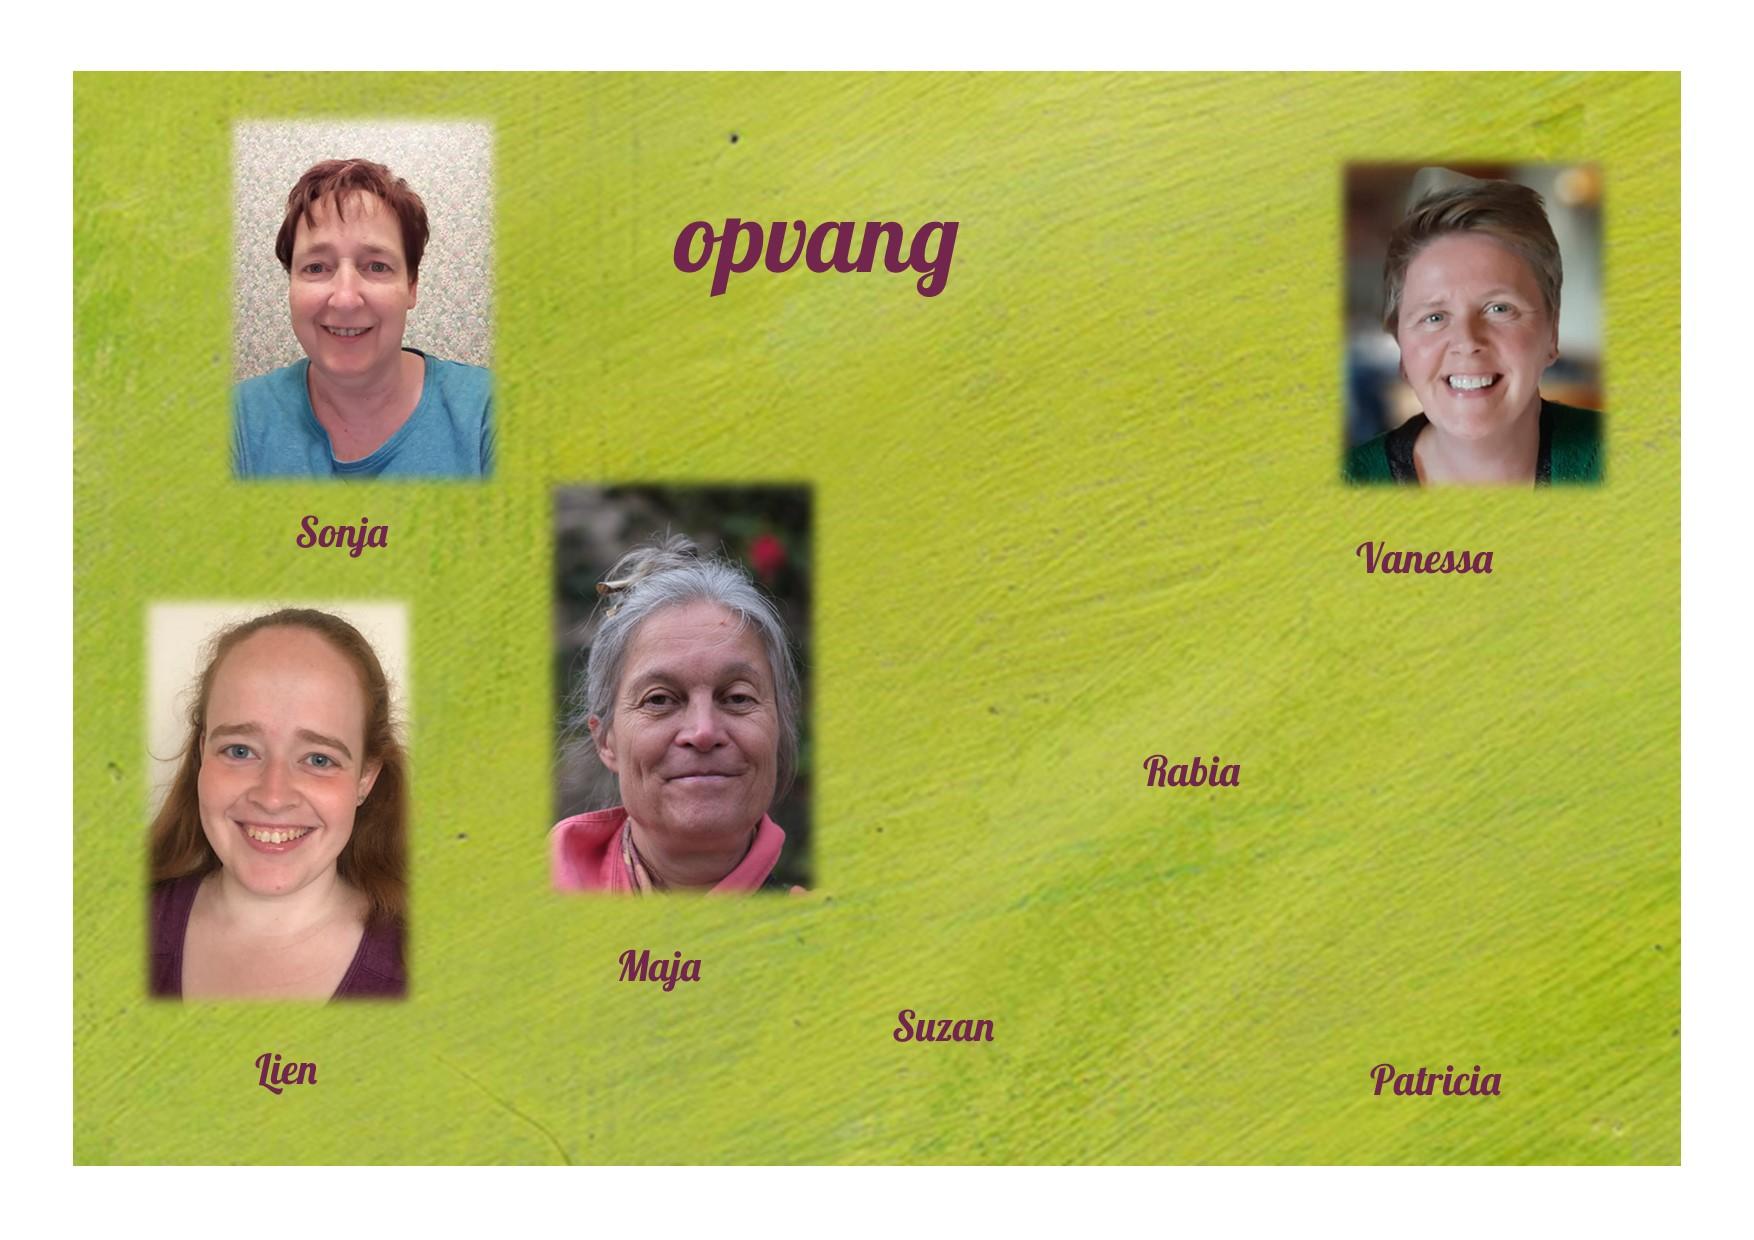 <p>buitenschoolse opvang: juf Lien, juf Sonja, juf Maja, juf Suzan, juf Rabia, juf Vanessa, juf Patricia …</p>